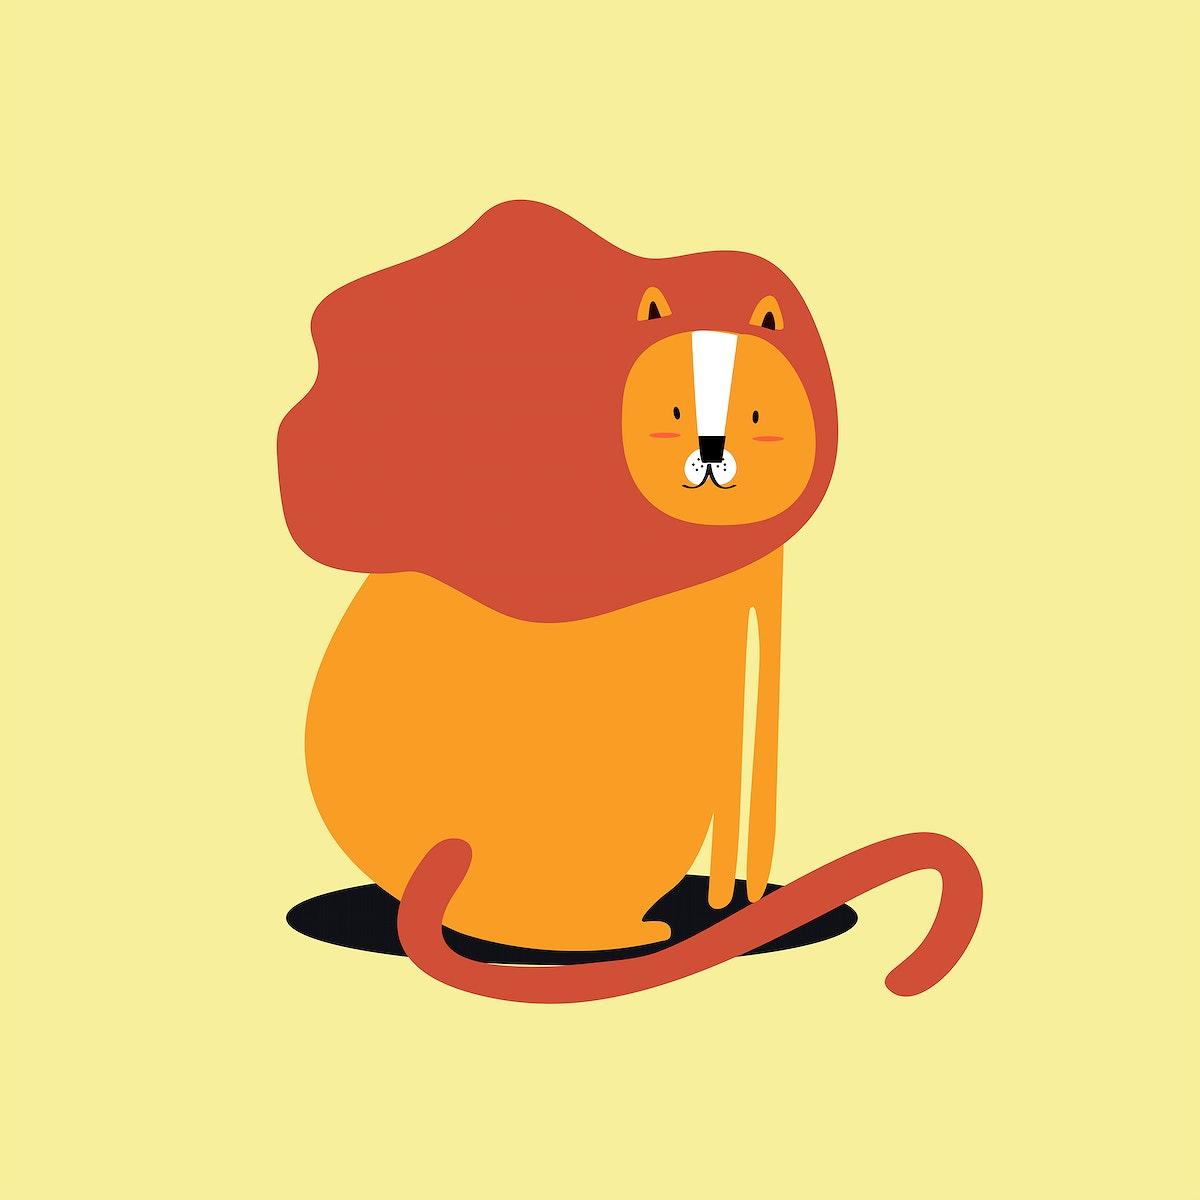 Lion animal cute wildlife cartoon illustration for kids